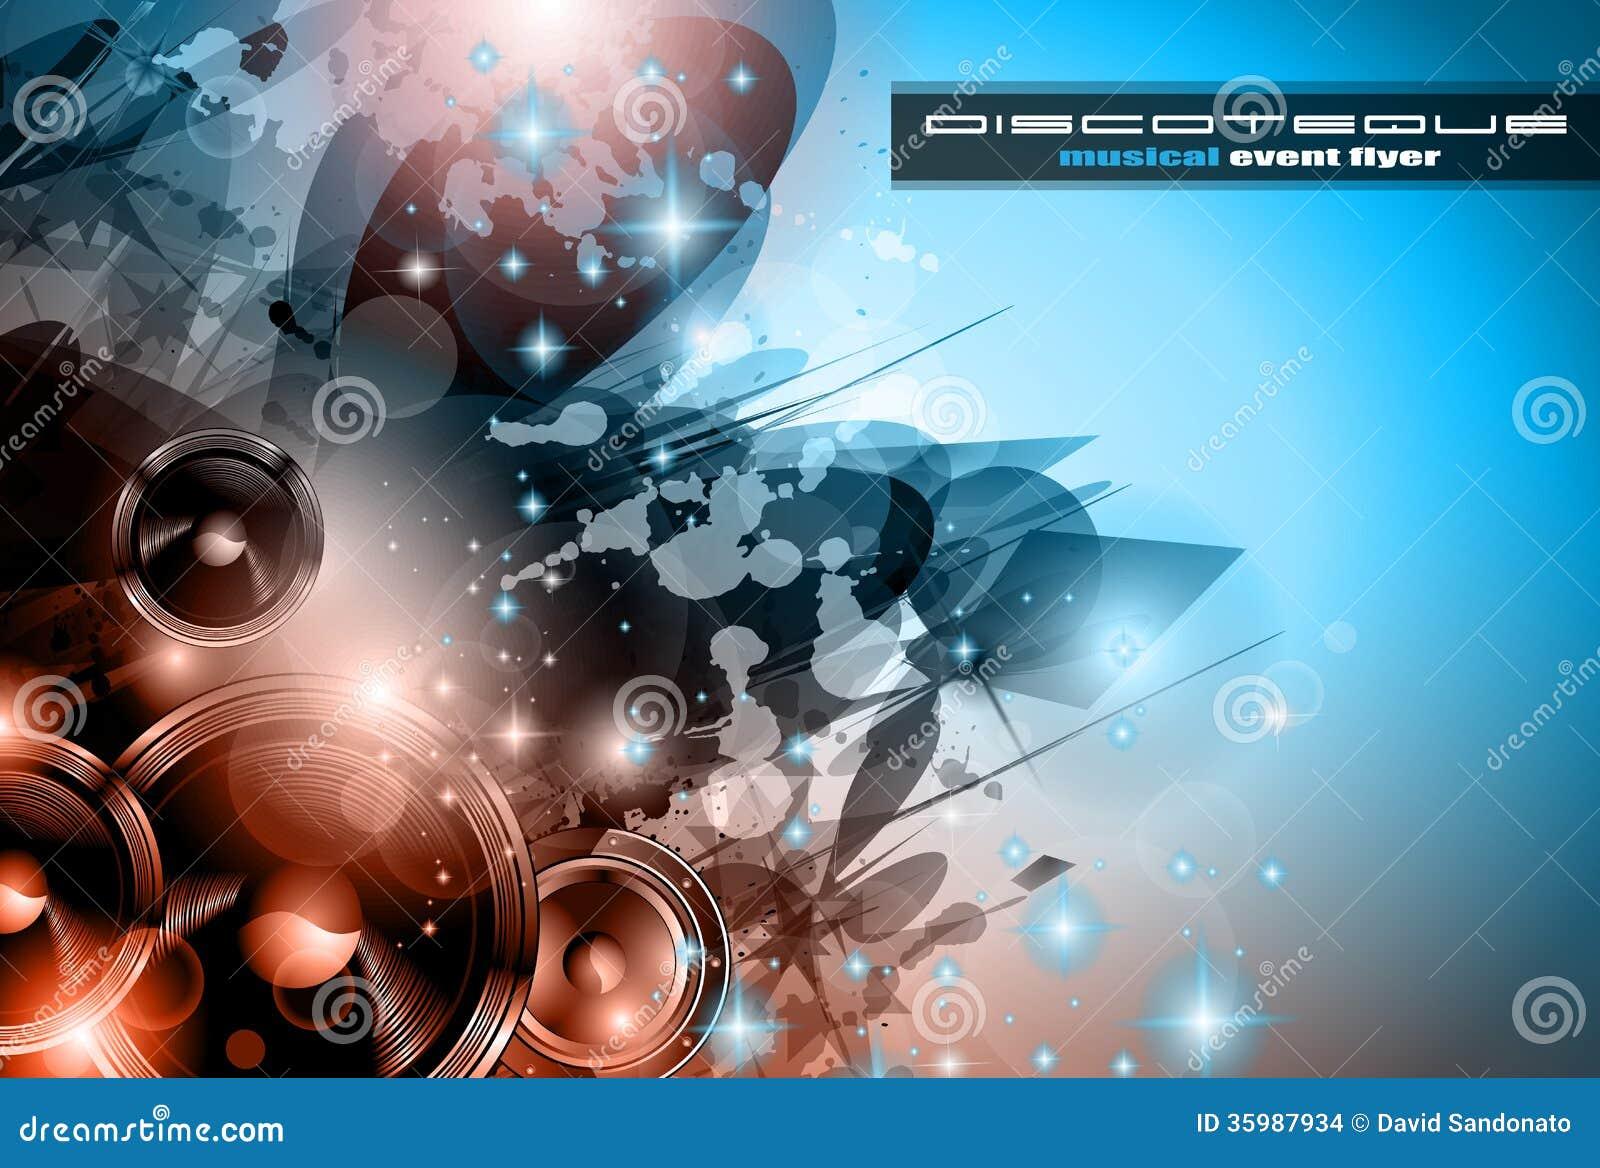 Poster backgrounds design - Background Club Dance Design